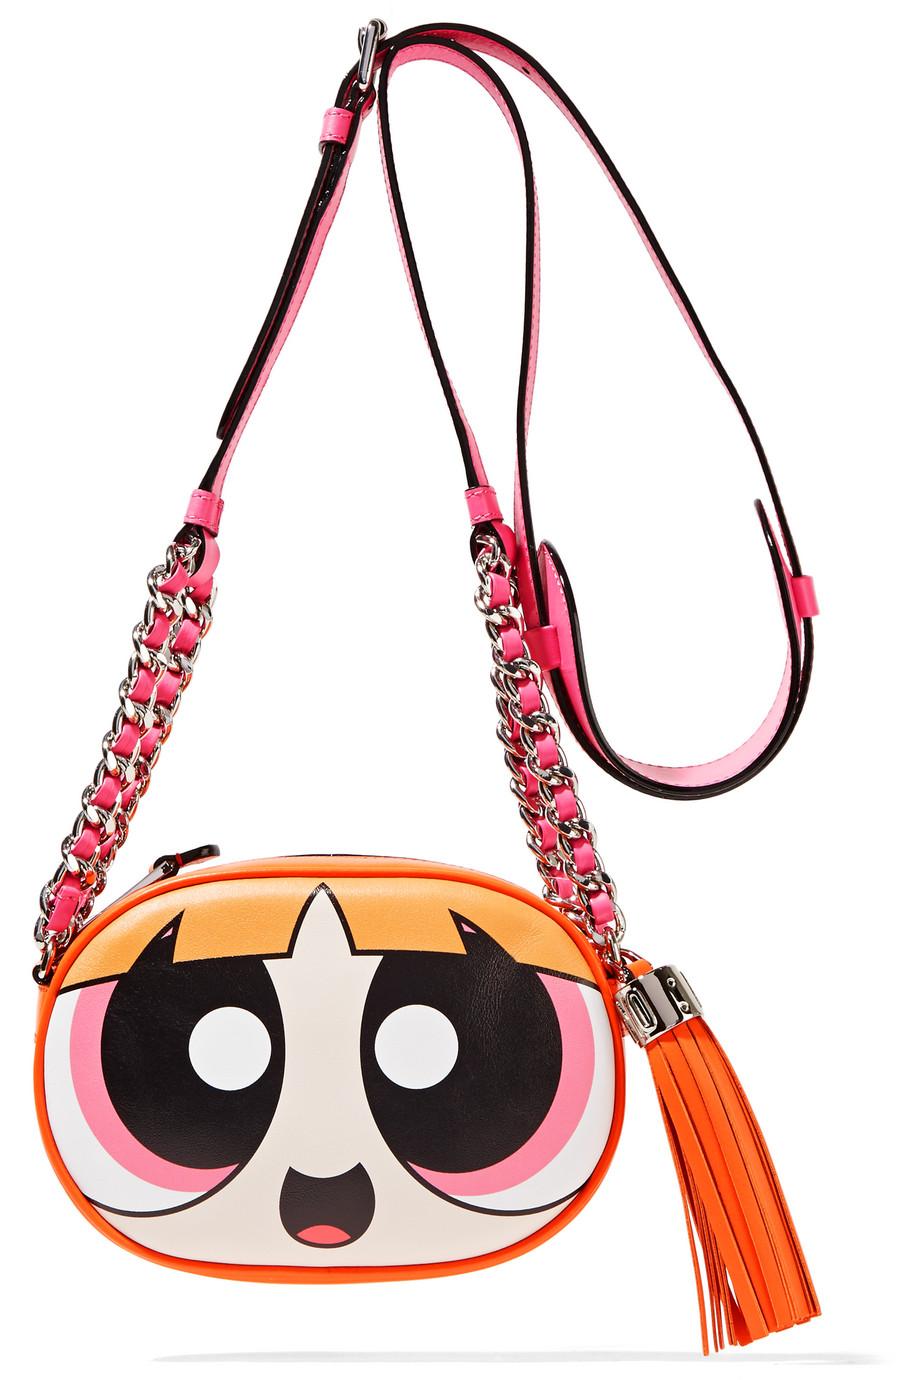 Moschino Leather Shoulder Bag, Fuchsia/Orange, Women's